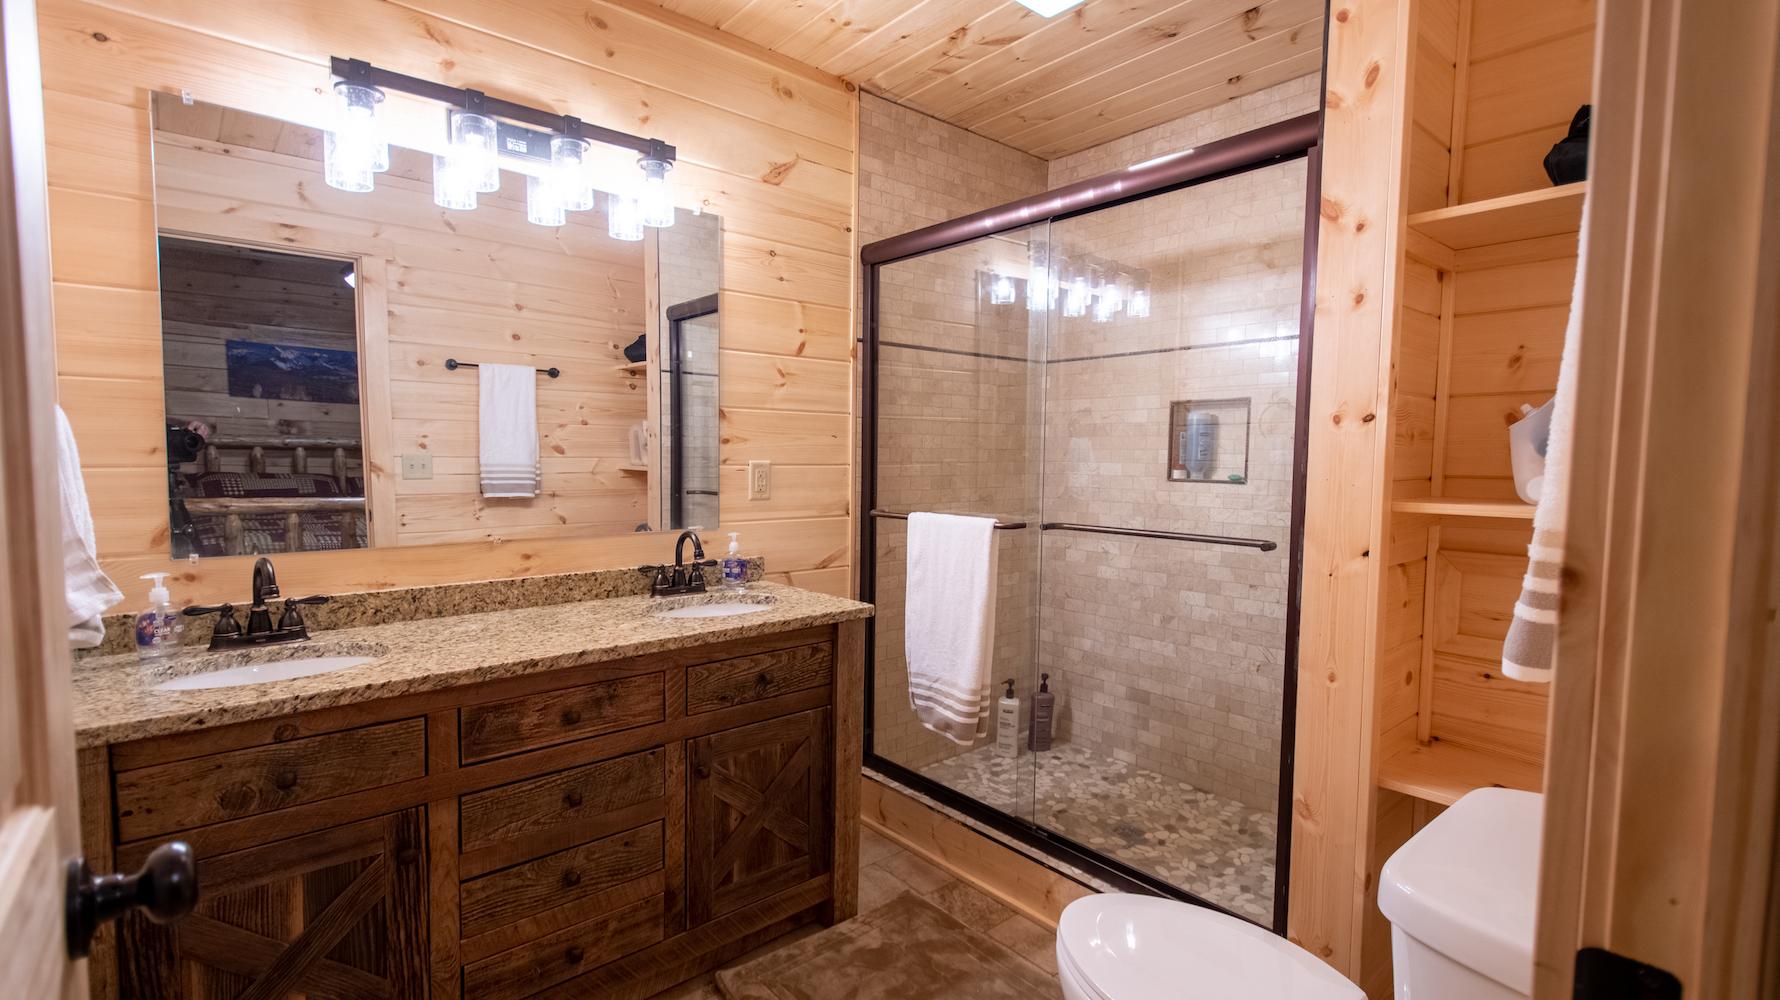 Photo 2006_8151.jpg - AHL Master Bathroom